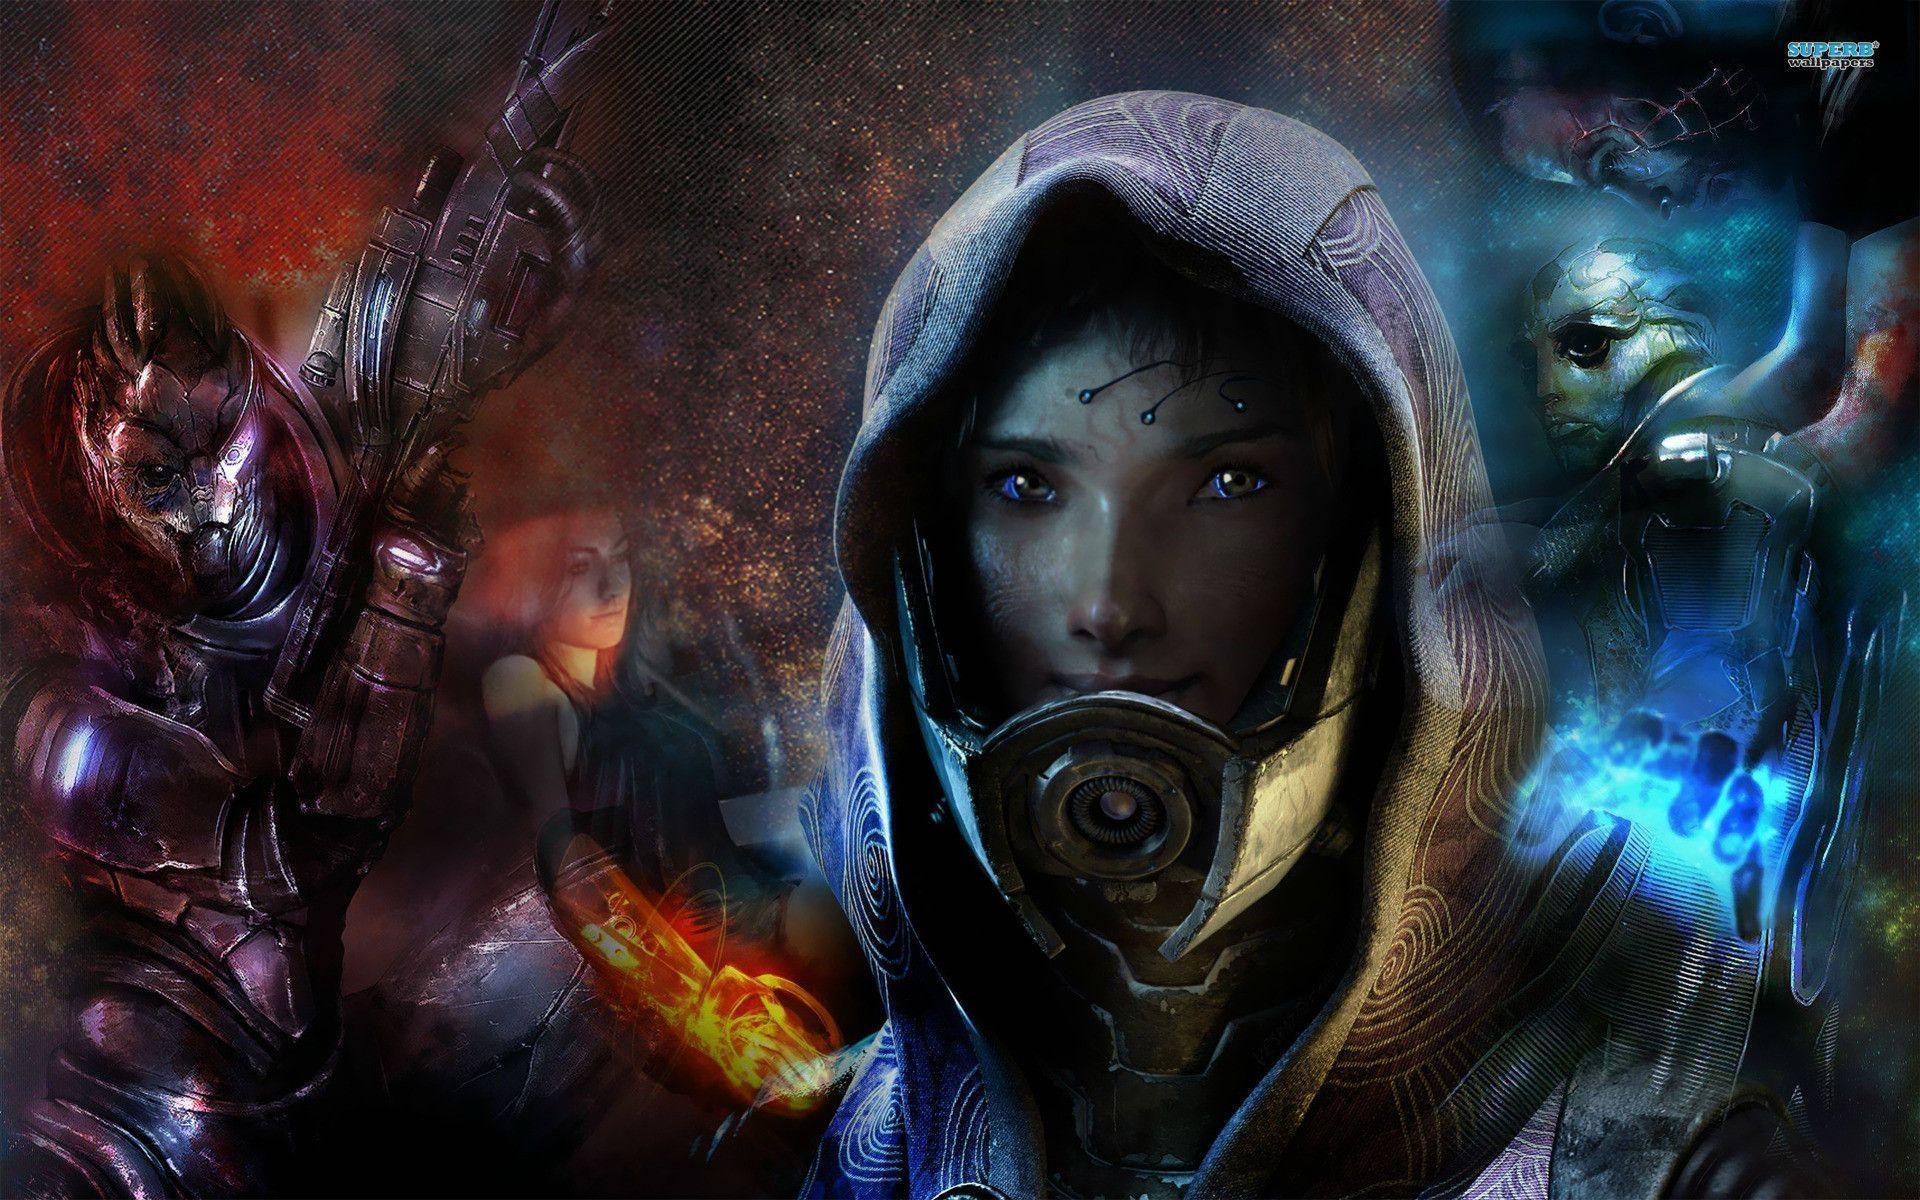 Mass Effect Tali Wallpapers - Wallpaper Cave